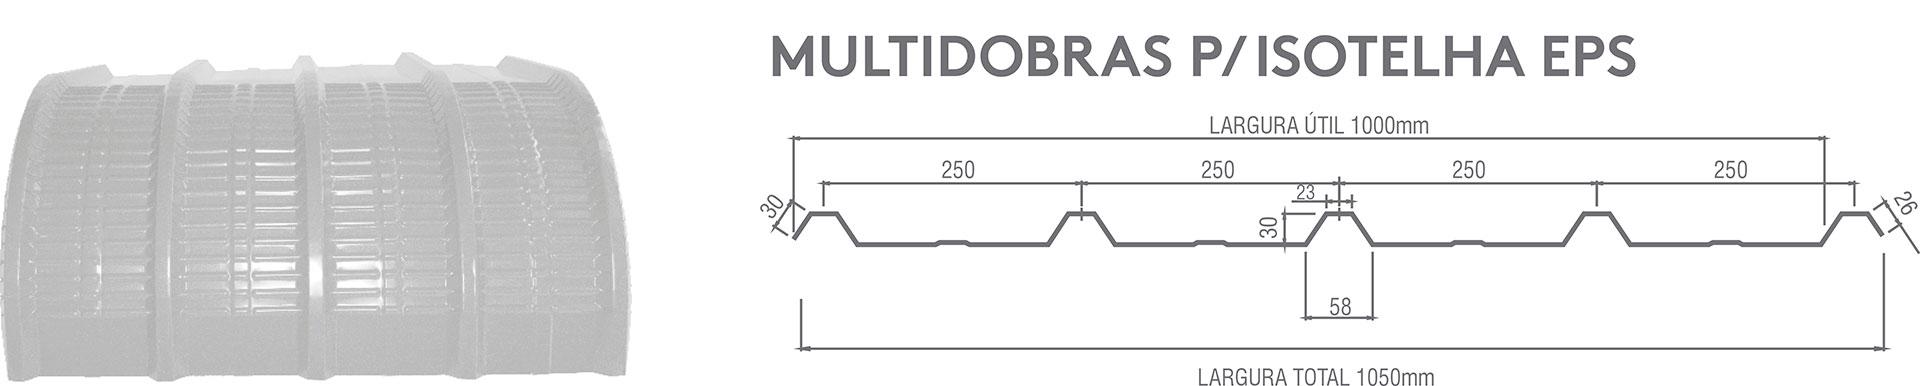 multidobras-isotelha-eps